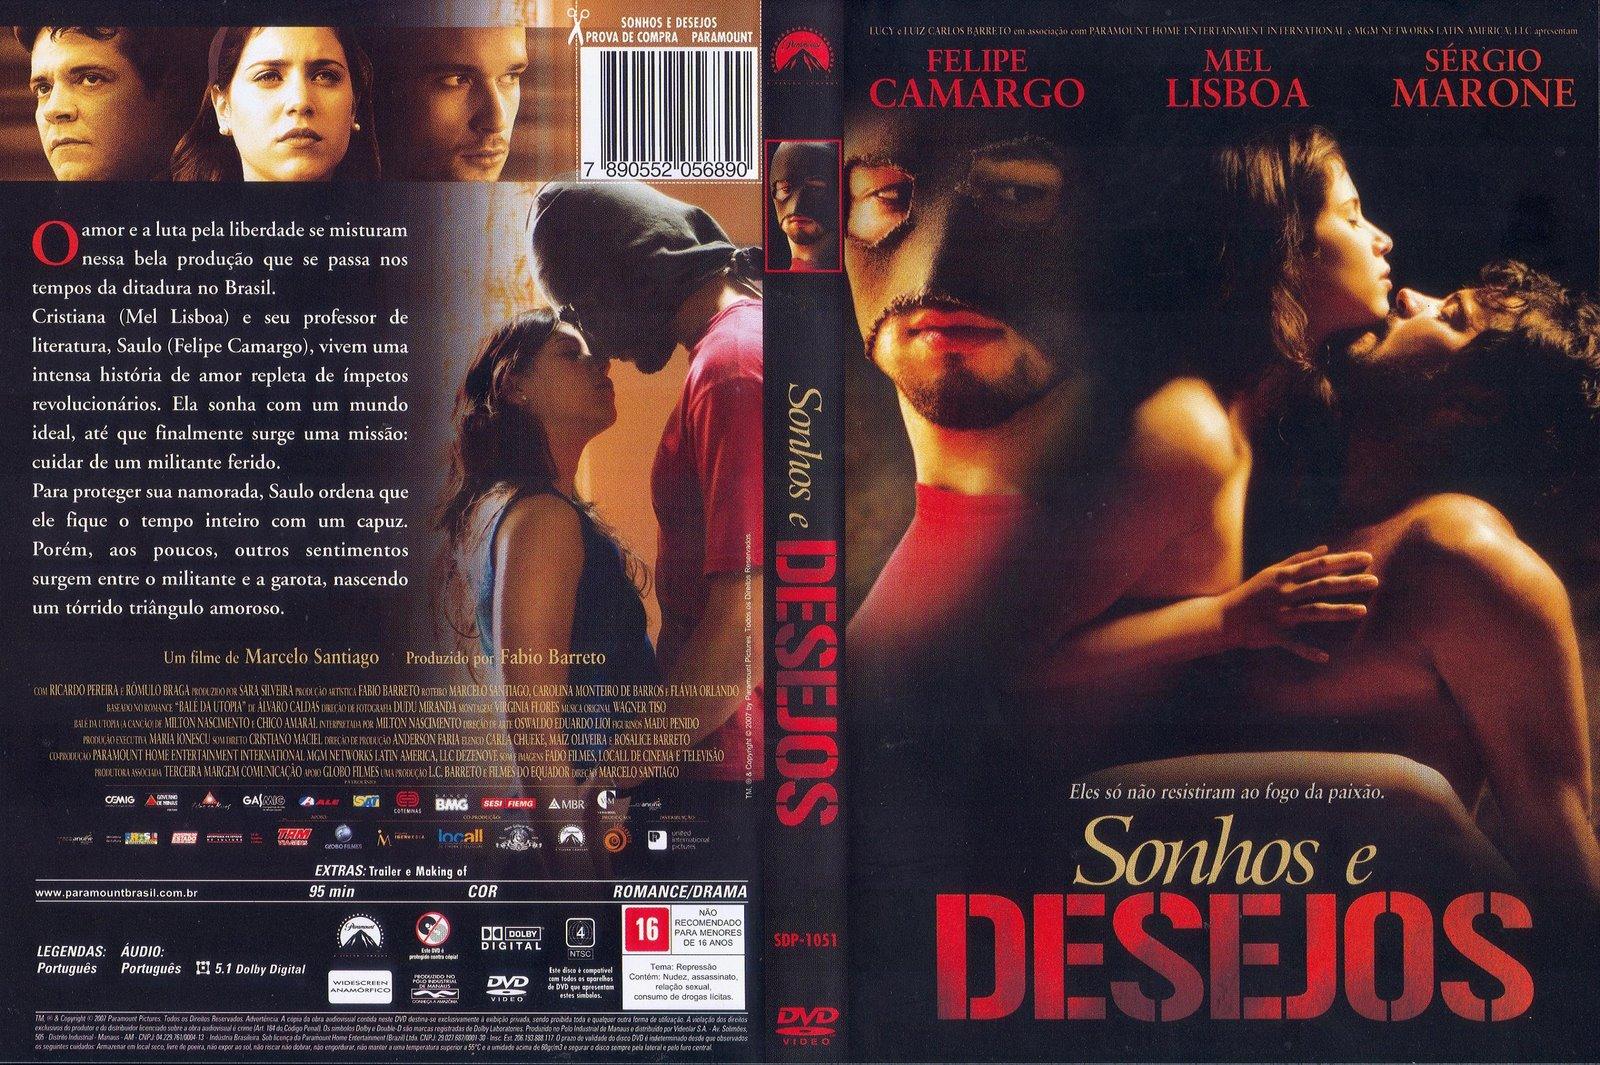 http://4.bp.blogspot.com/_UIkyBpFTkN0/TDzFAAZJEPI/AAAAAAAAAQA/k_7WxYI3HrM/s1600/Sonhos_E_Desejos.jpg